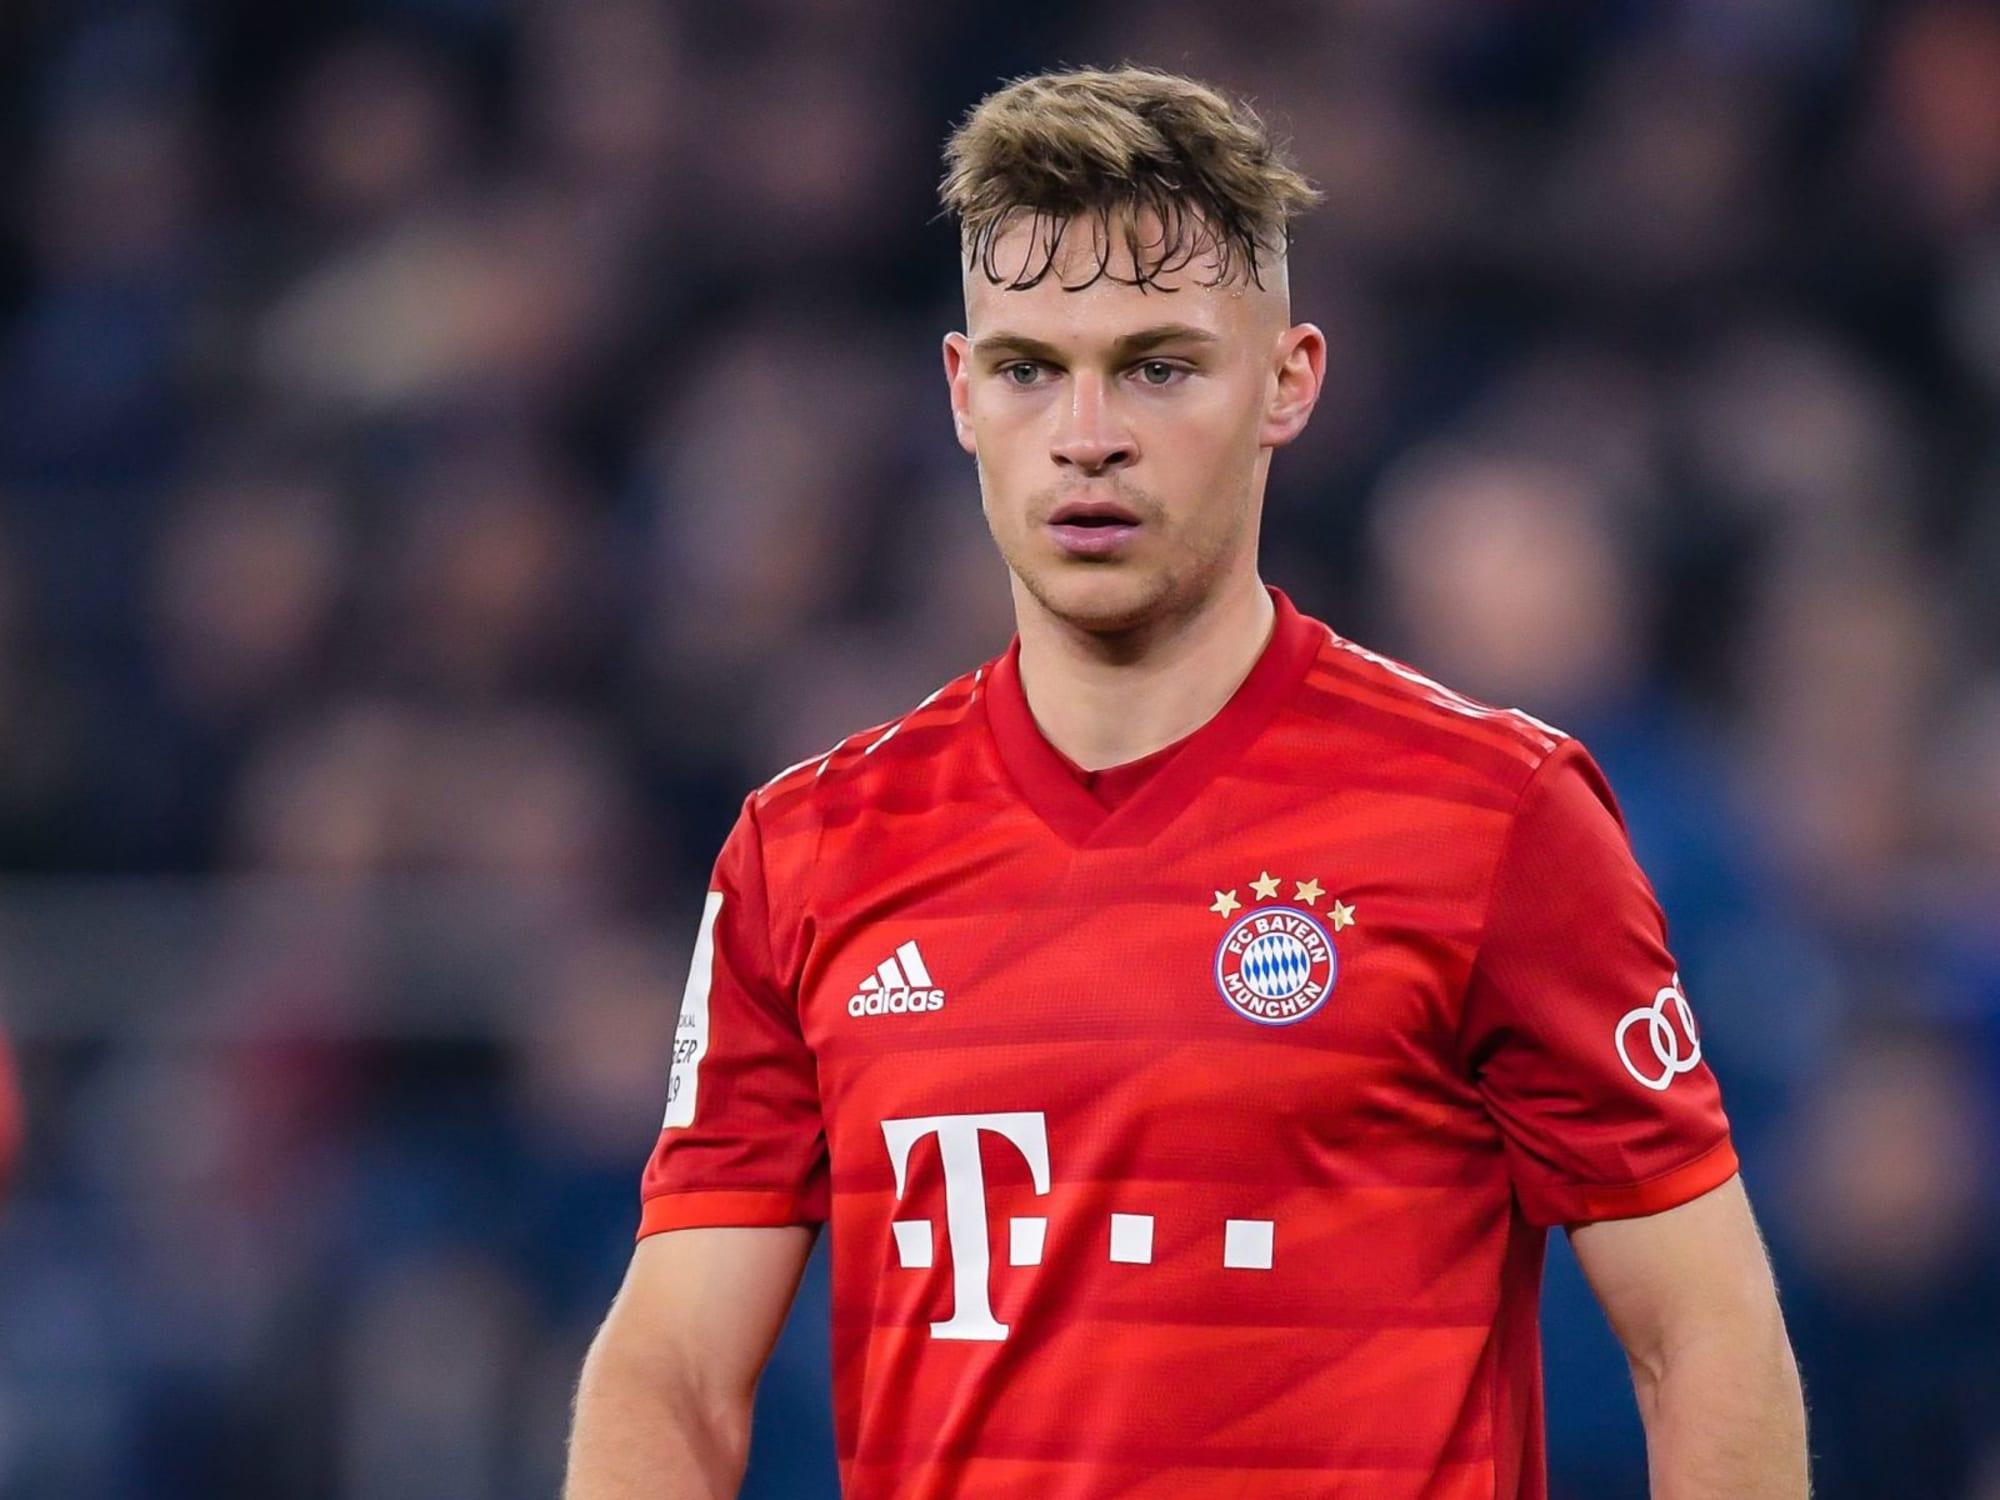 Bayern Munich: Joshua Kimmich is the most versatile squad player